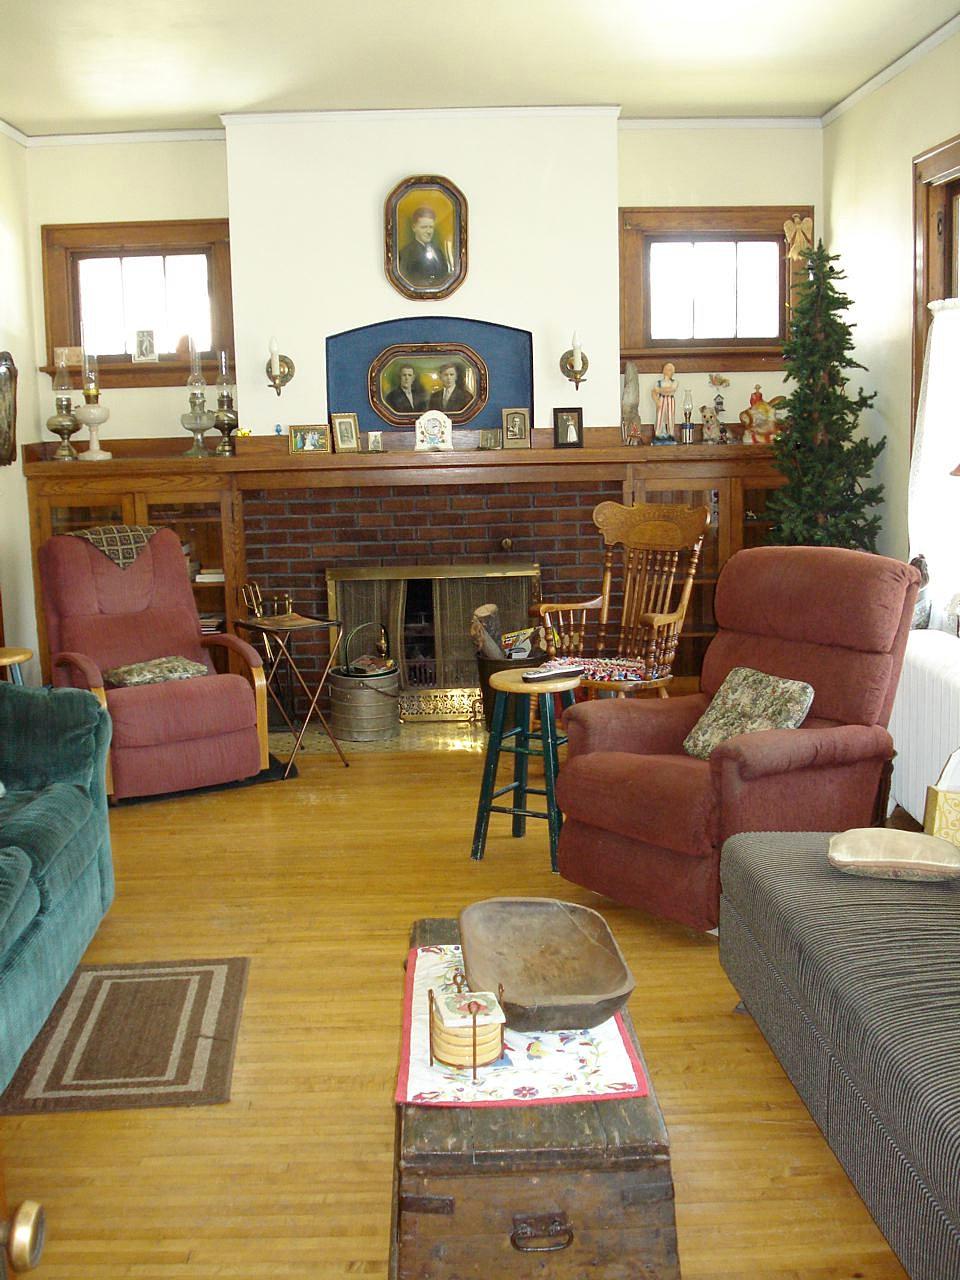 Blueskyrealestatedl 807 6th st ne living for Living room west 6 brooklyn